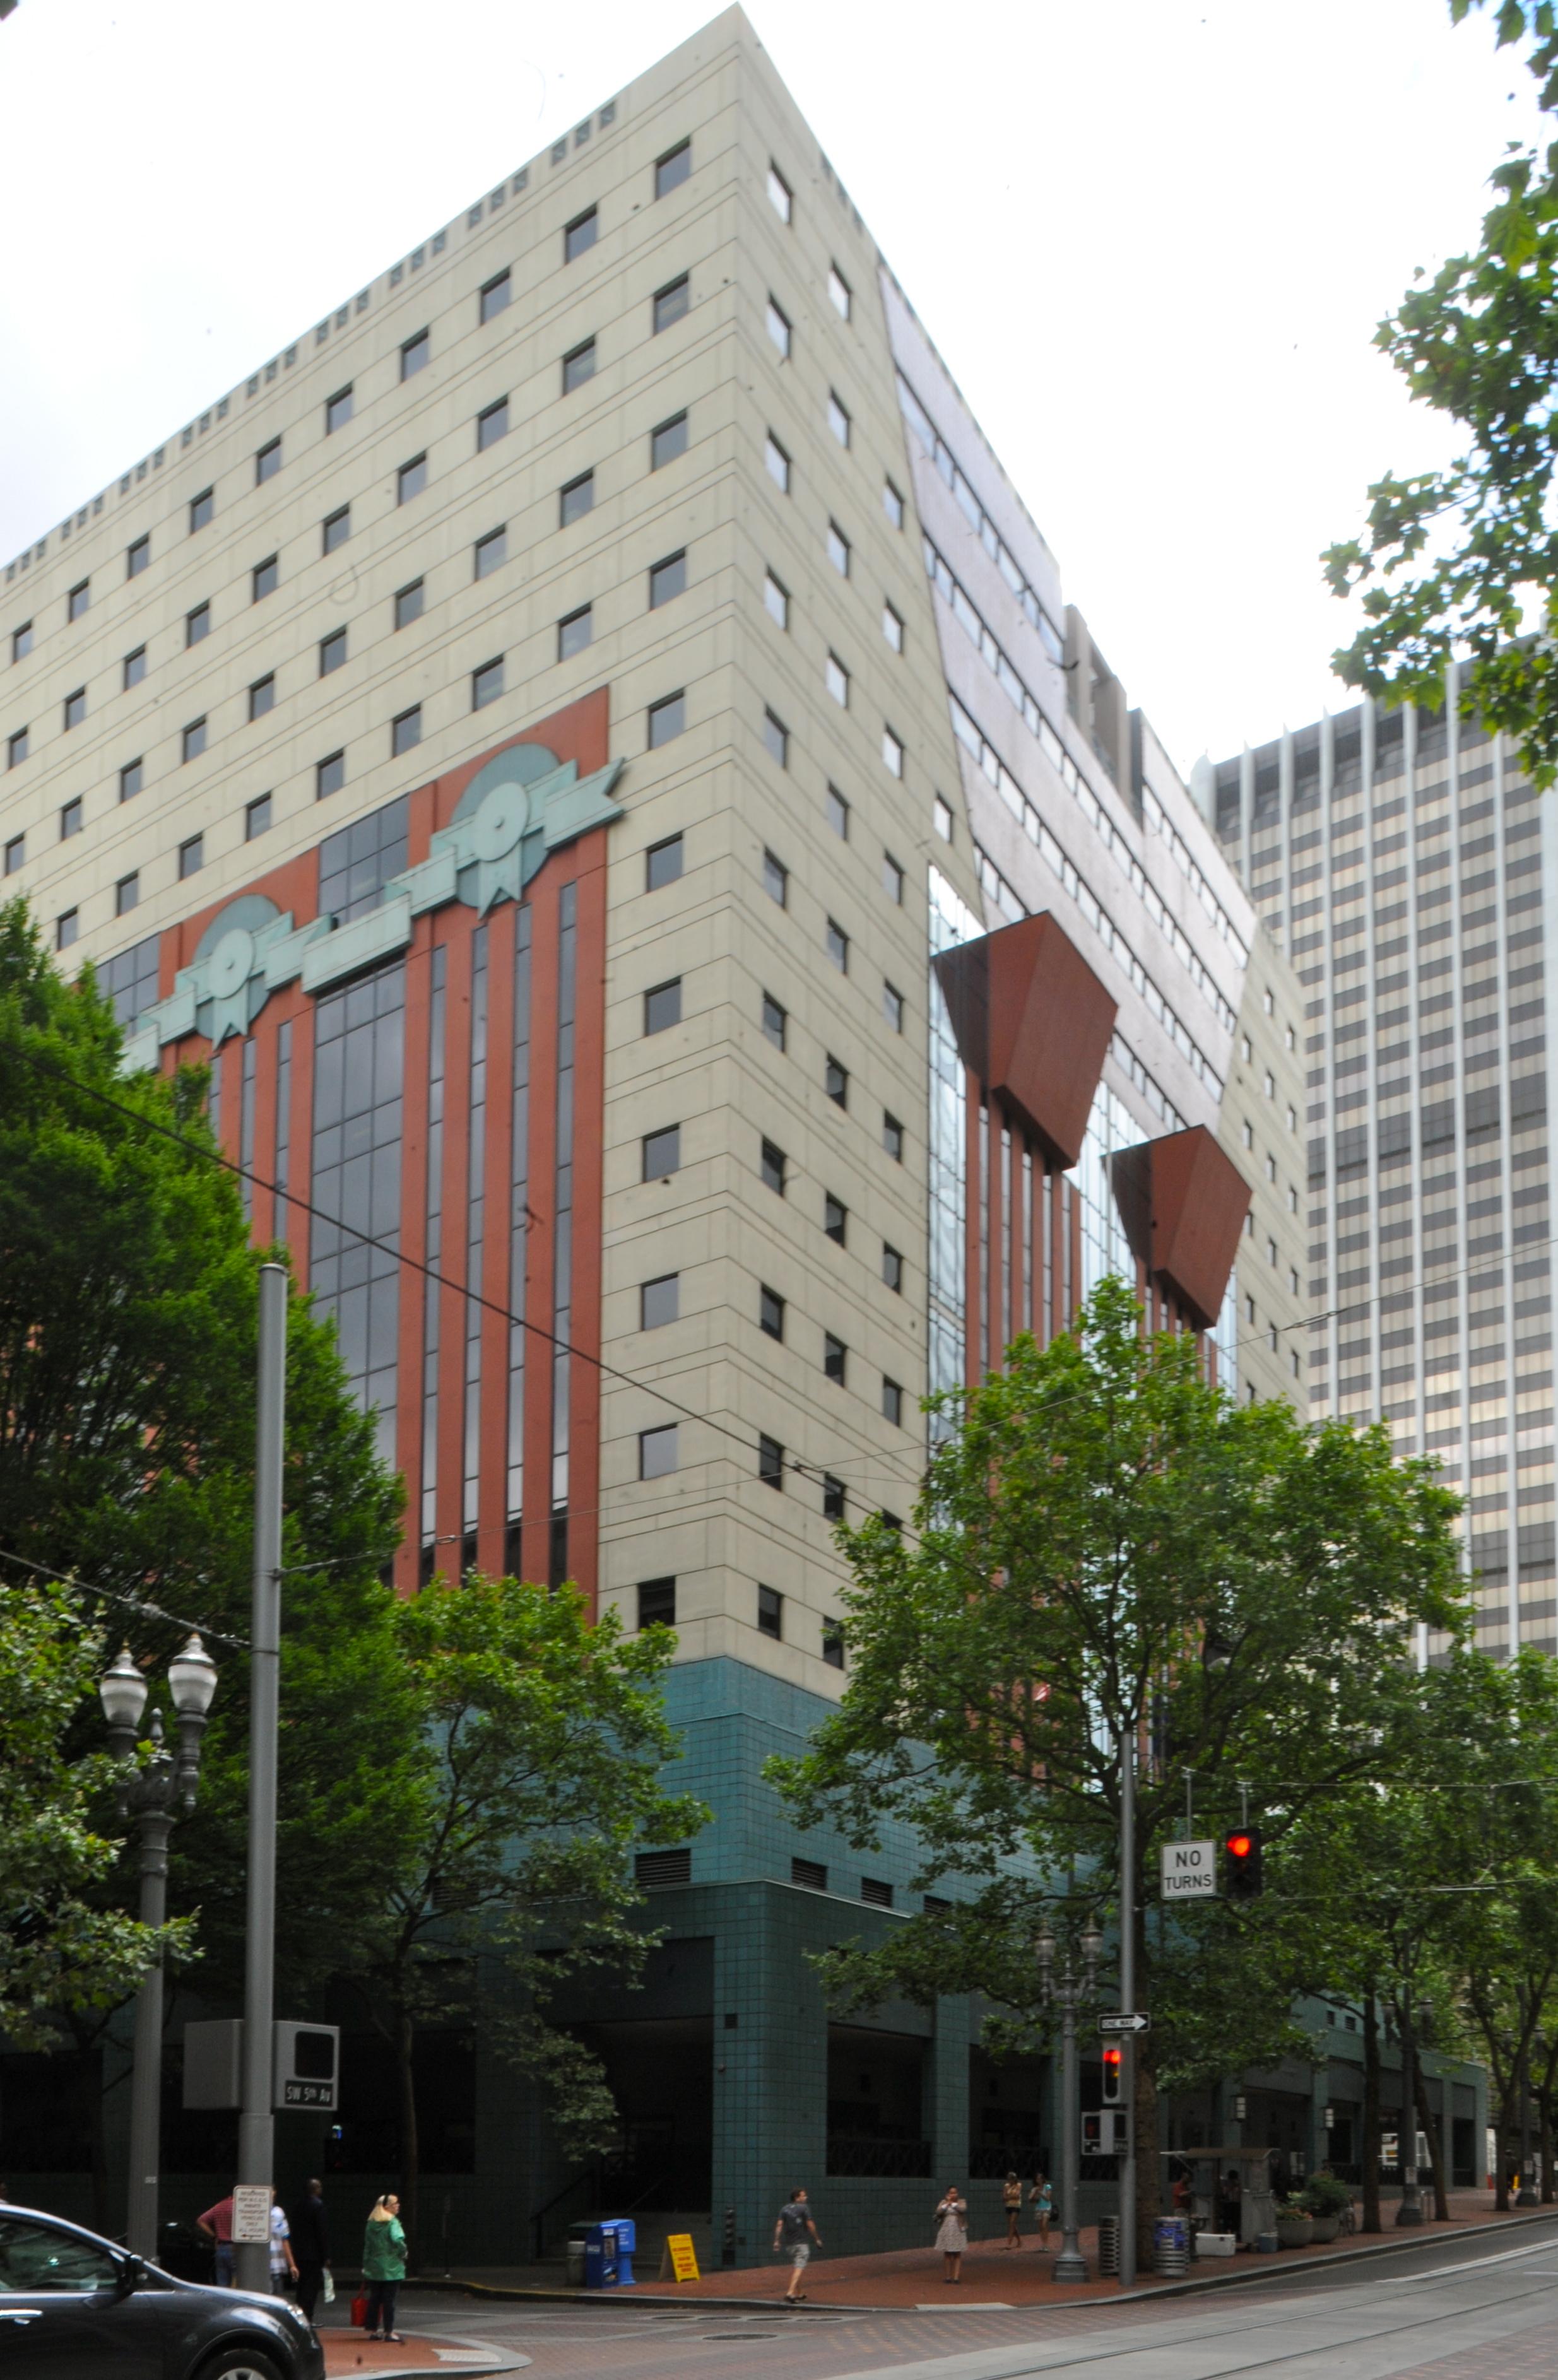 The Portland Building